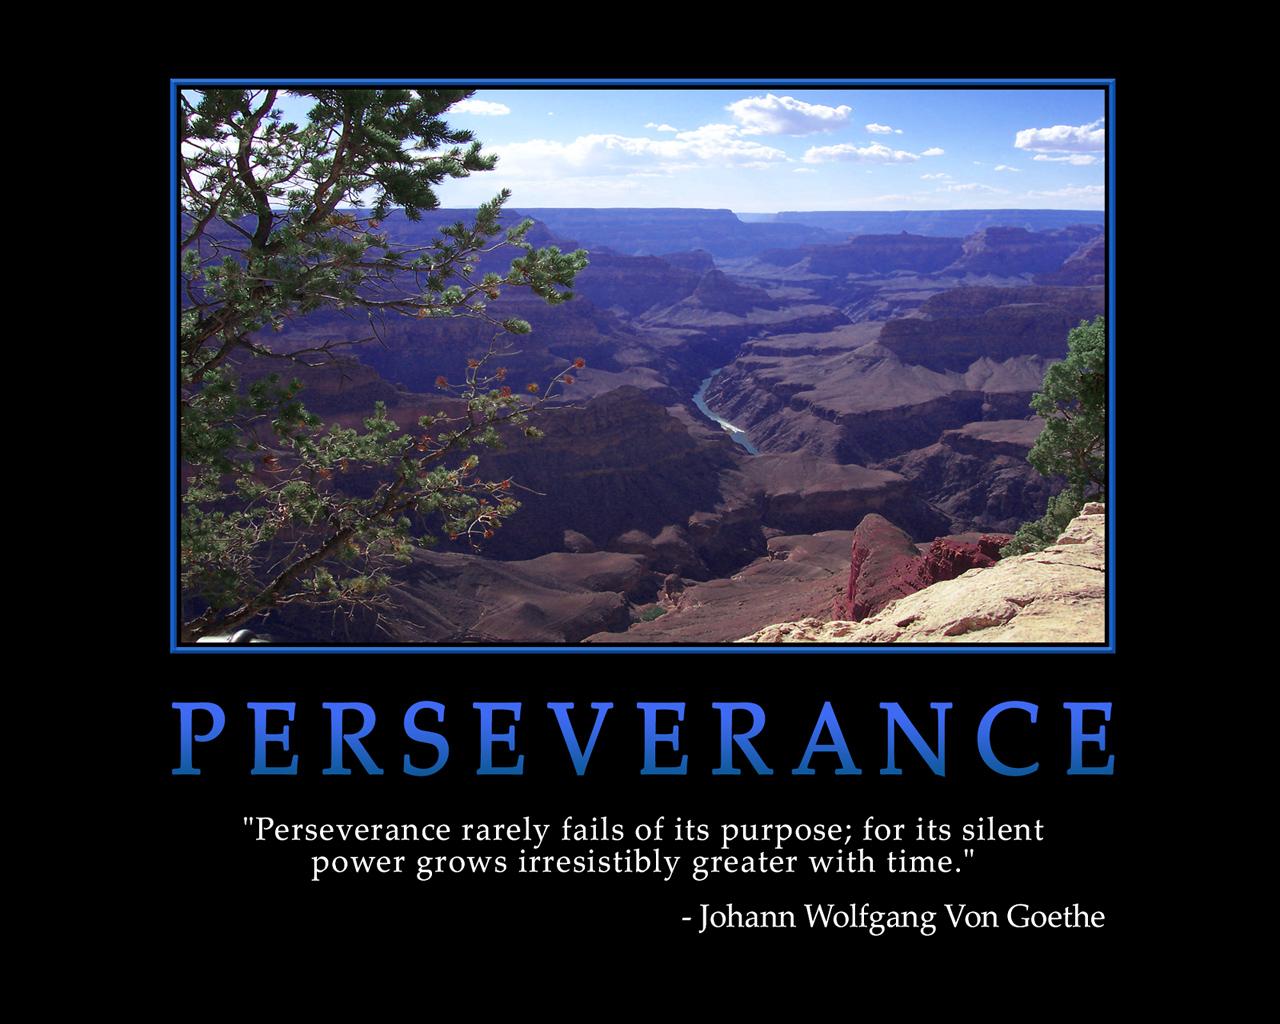 perseverance motivational wallpaper